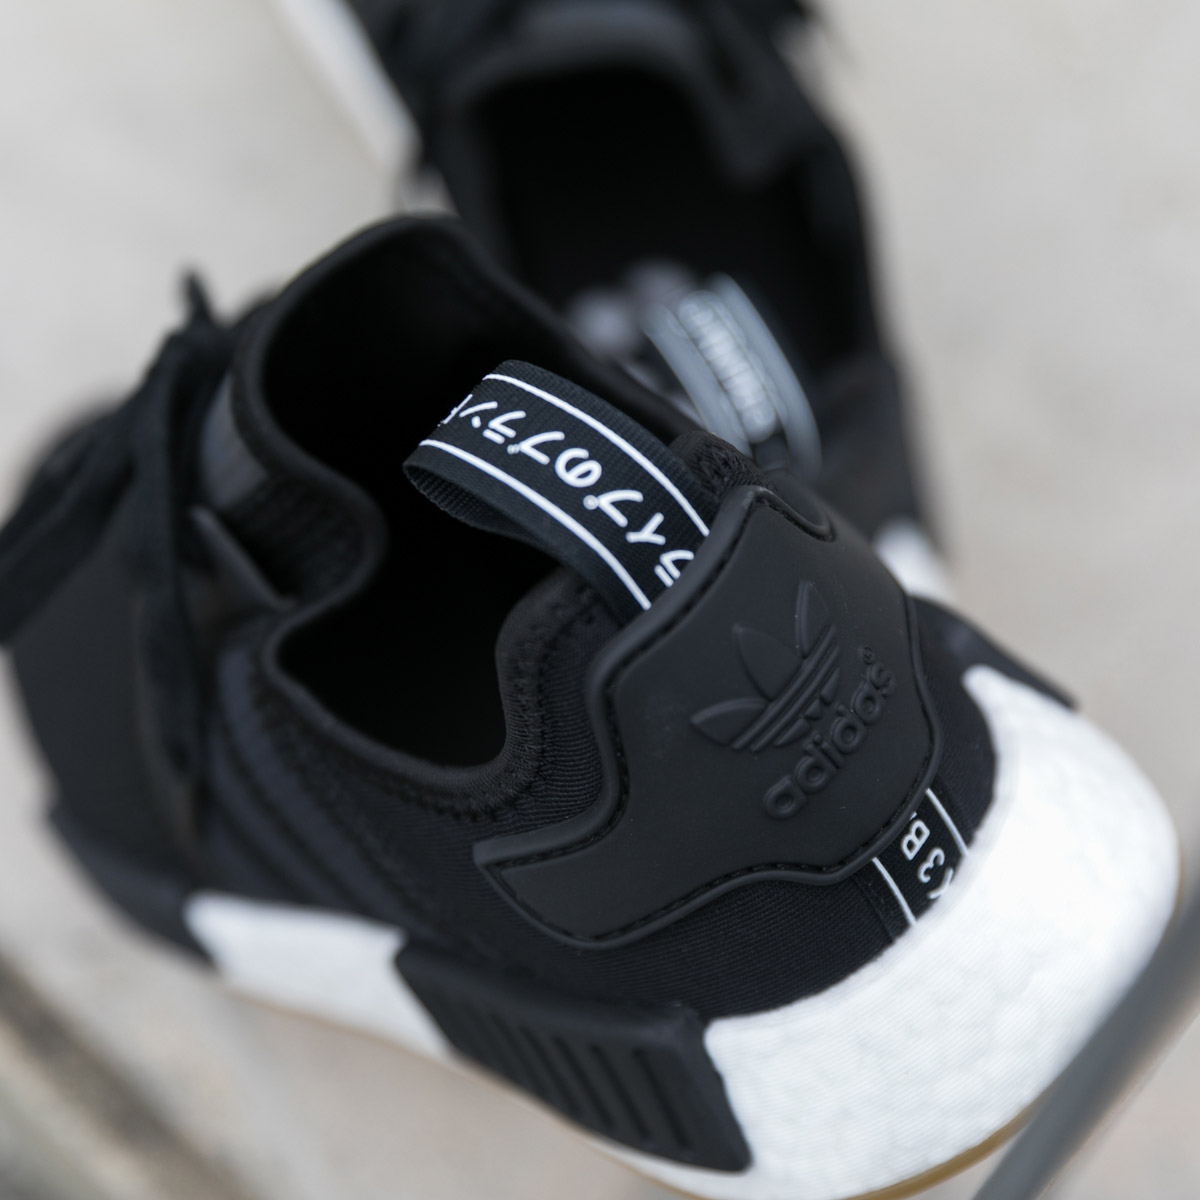 8e7001913 adidas Originals NMD R1 (Adidas N M D R1) Core Black Core Black Gum 18FW-I